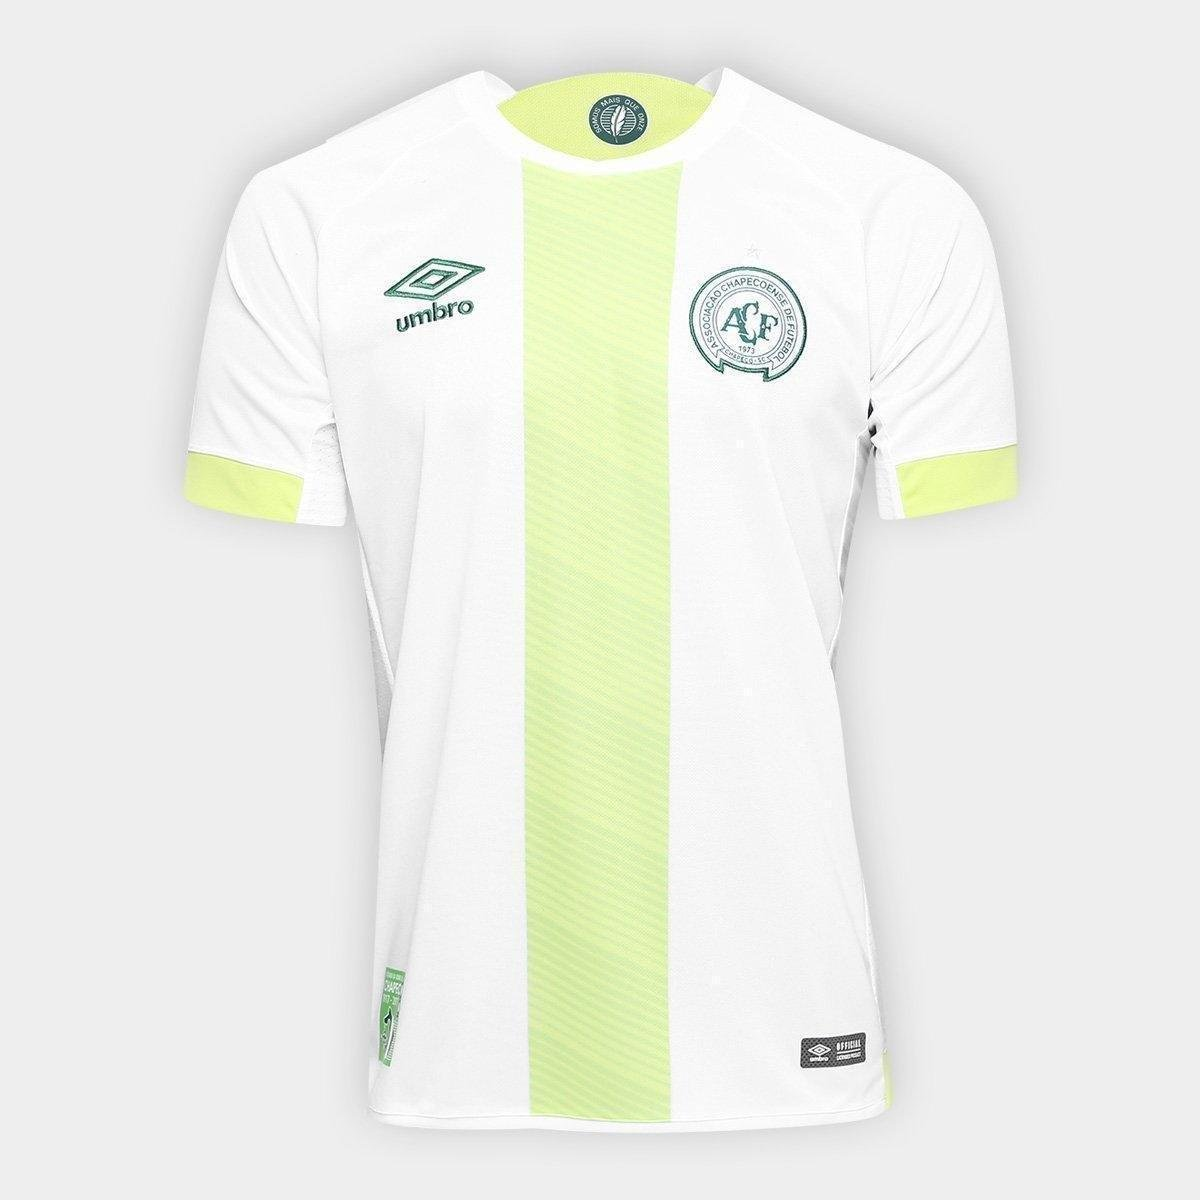 e75cec25b5 Camisa Chapecoense II 17/18 s/nº Torcedor Umbro Masculina - Branco e Verde  | Loja da Chape